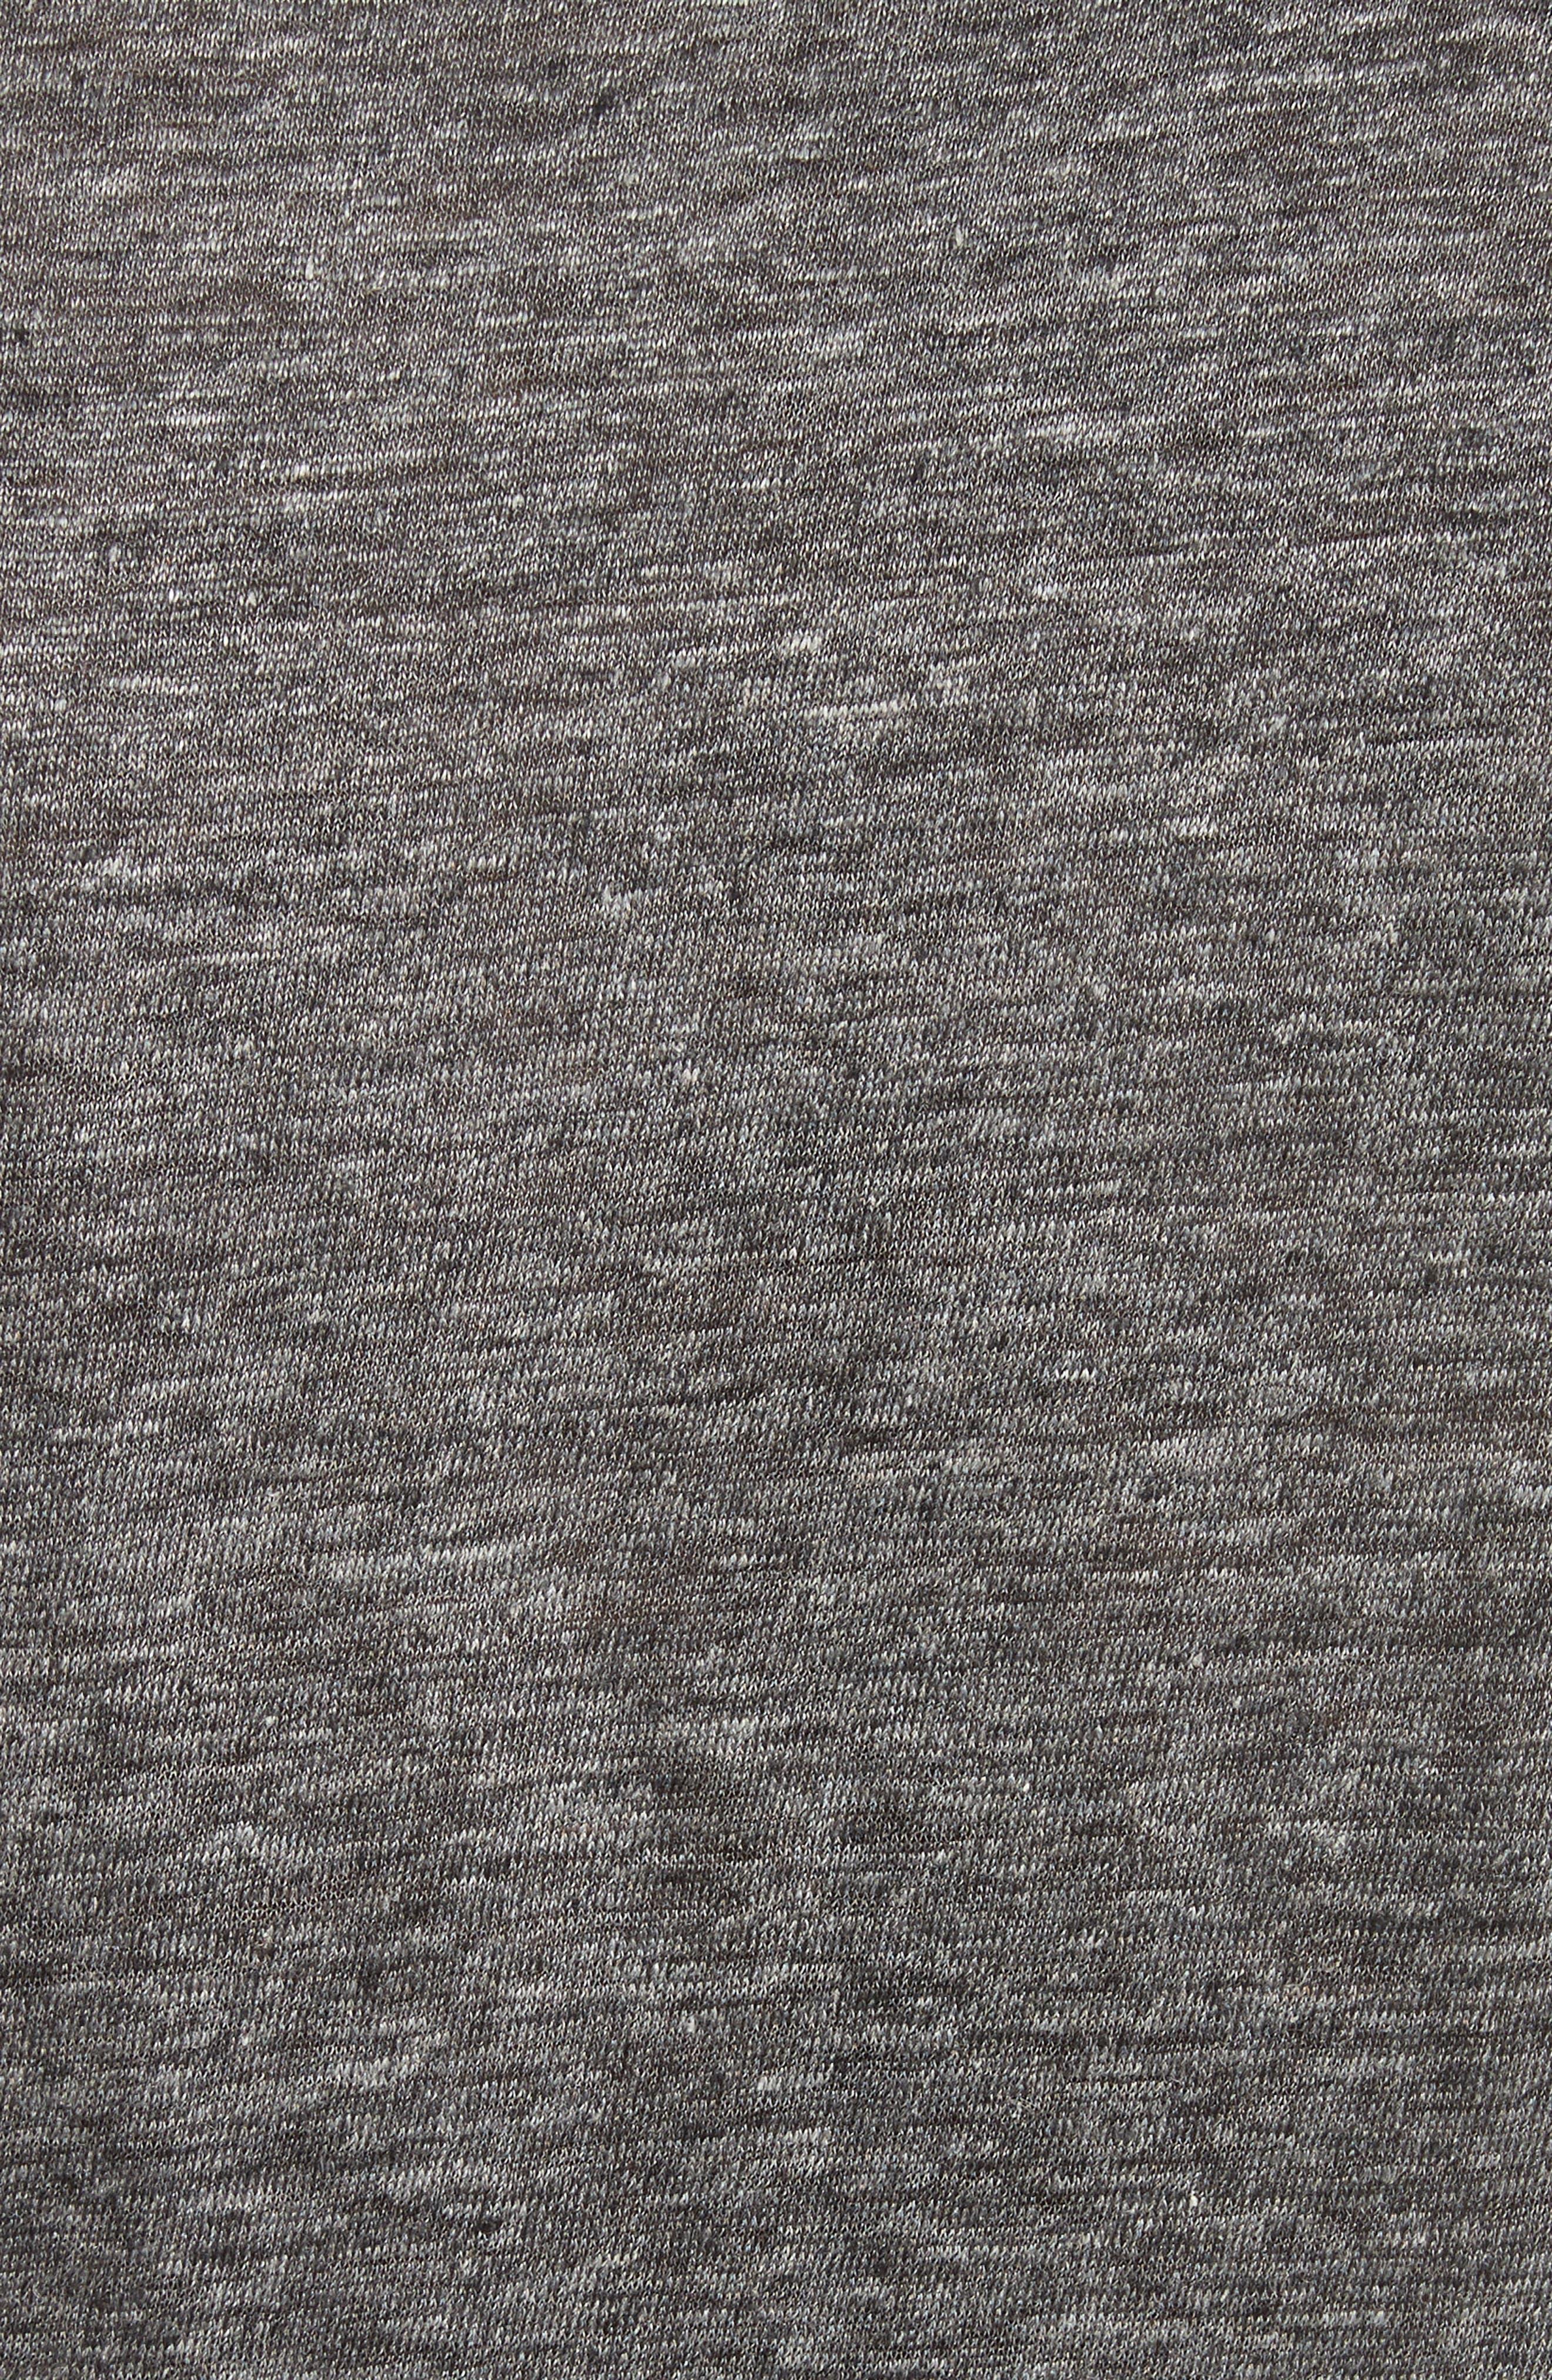 Alternate Image 5  - John Varvatos Collection Stripe Linen Henley T-Shirt